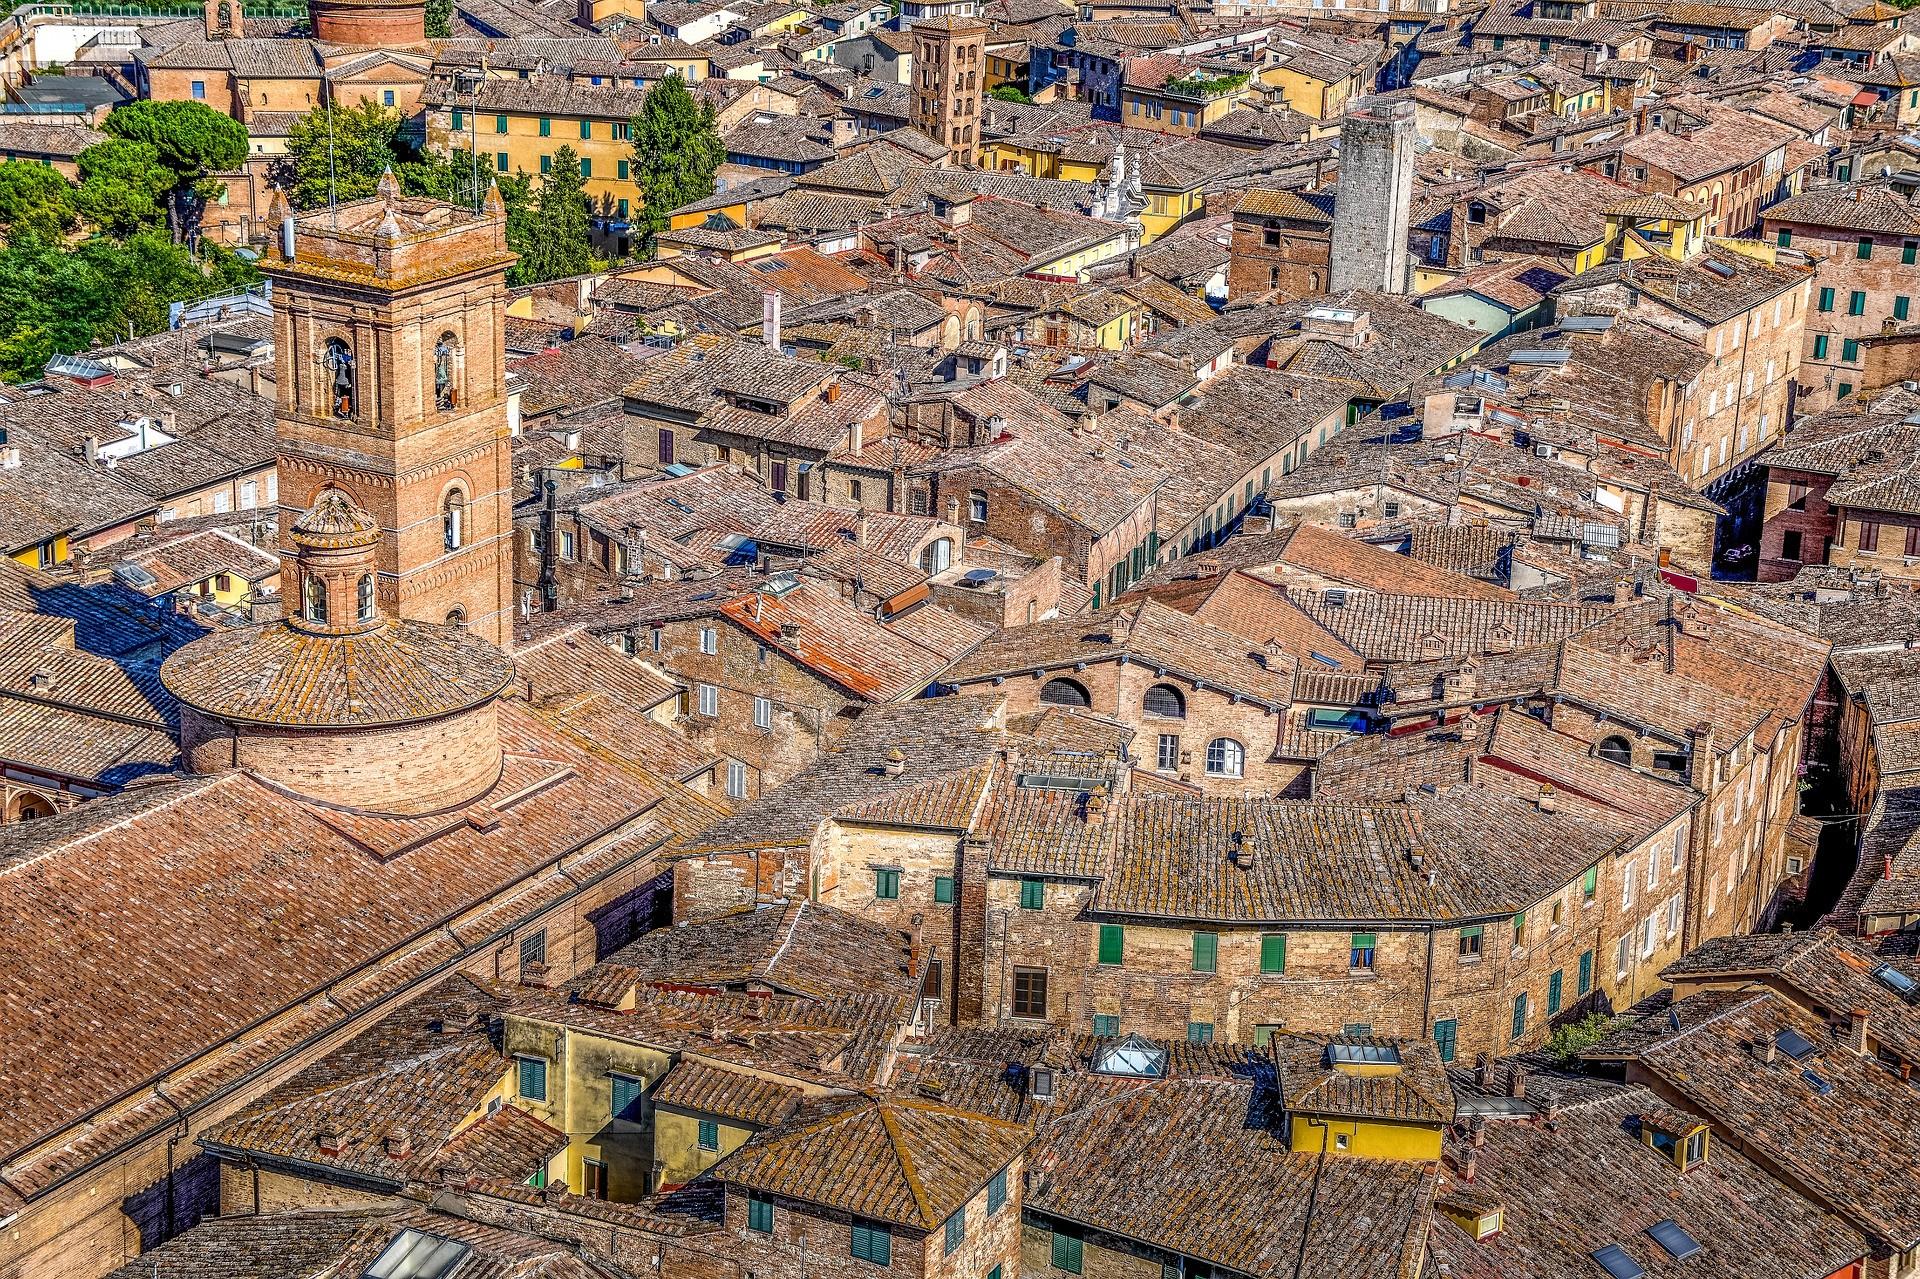 Panorama di Siena - Foto di Zotx